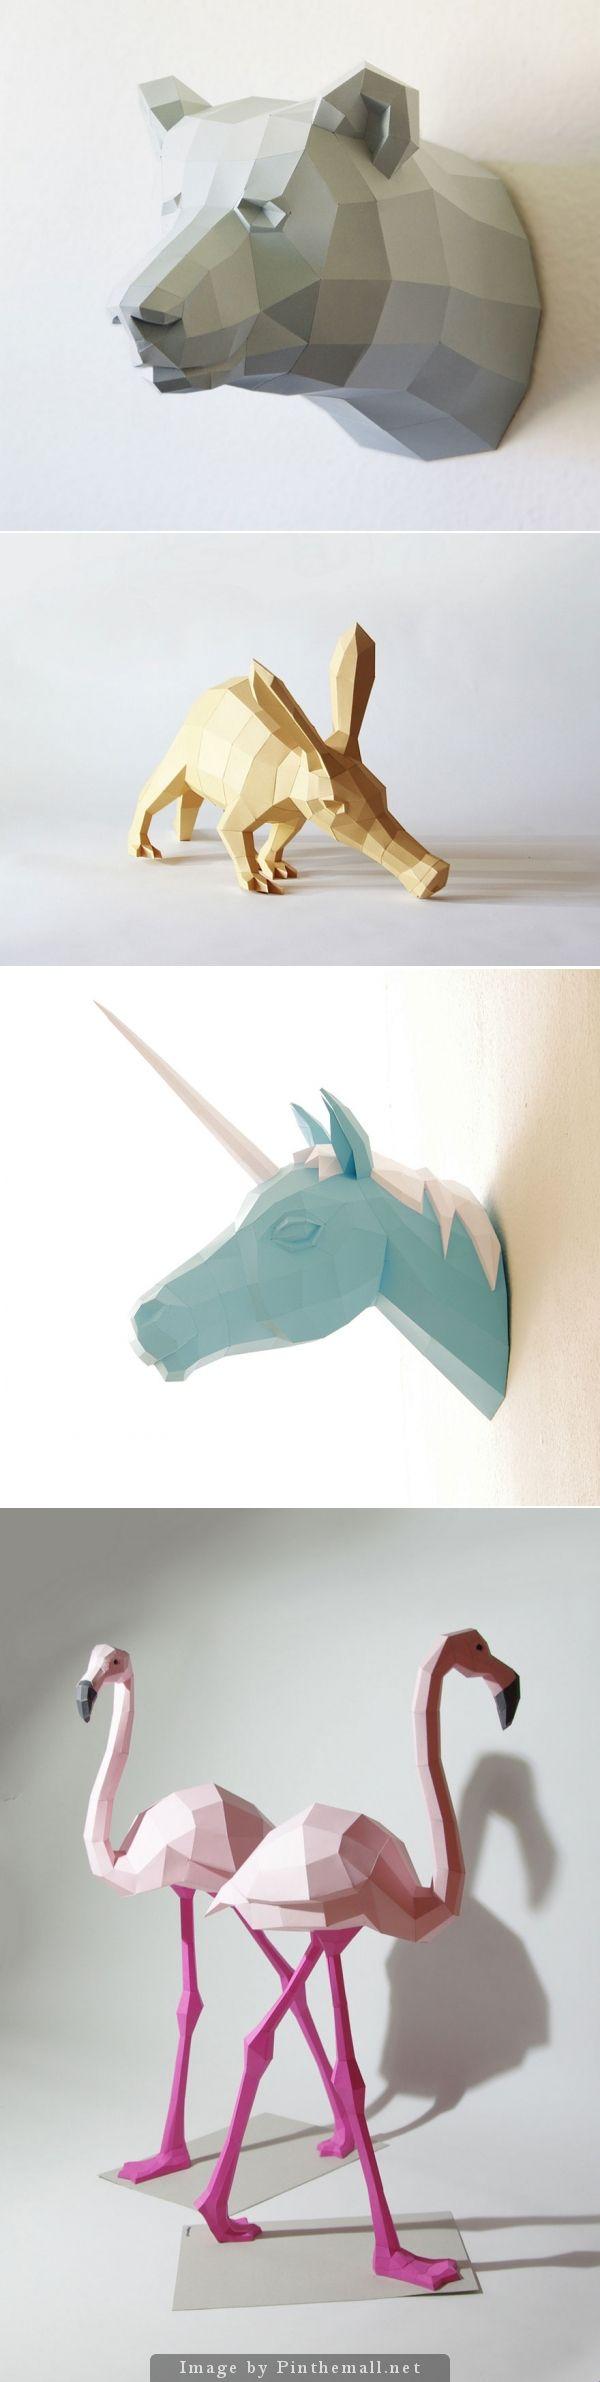 Geometric paper sculptures by Wolfram Kampffmeyer